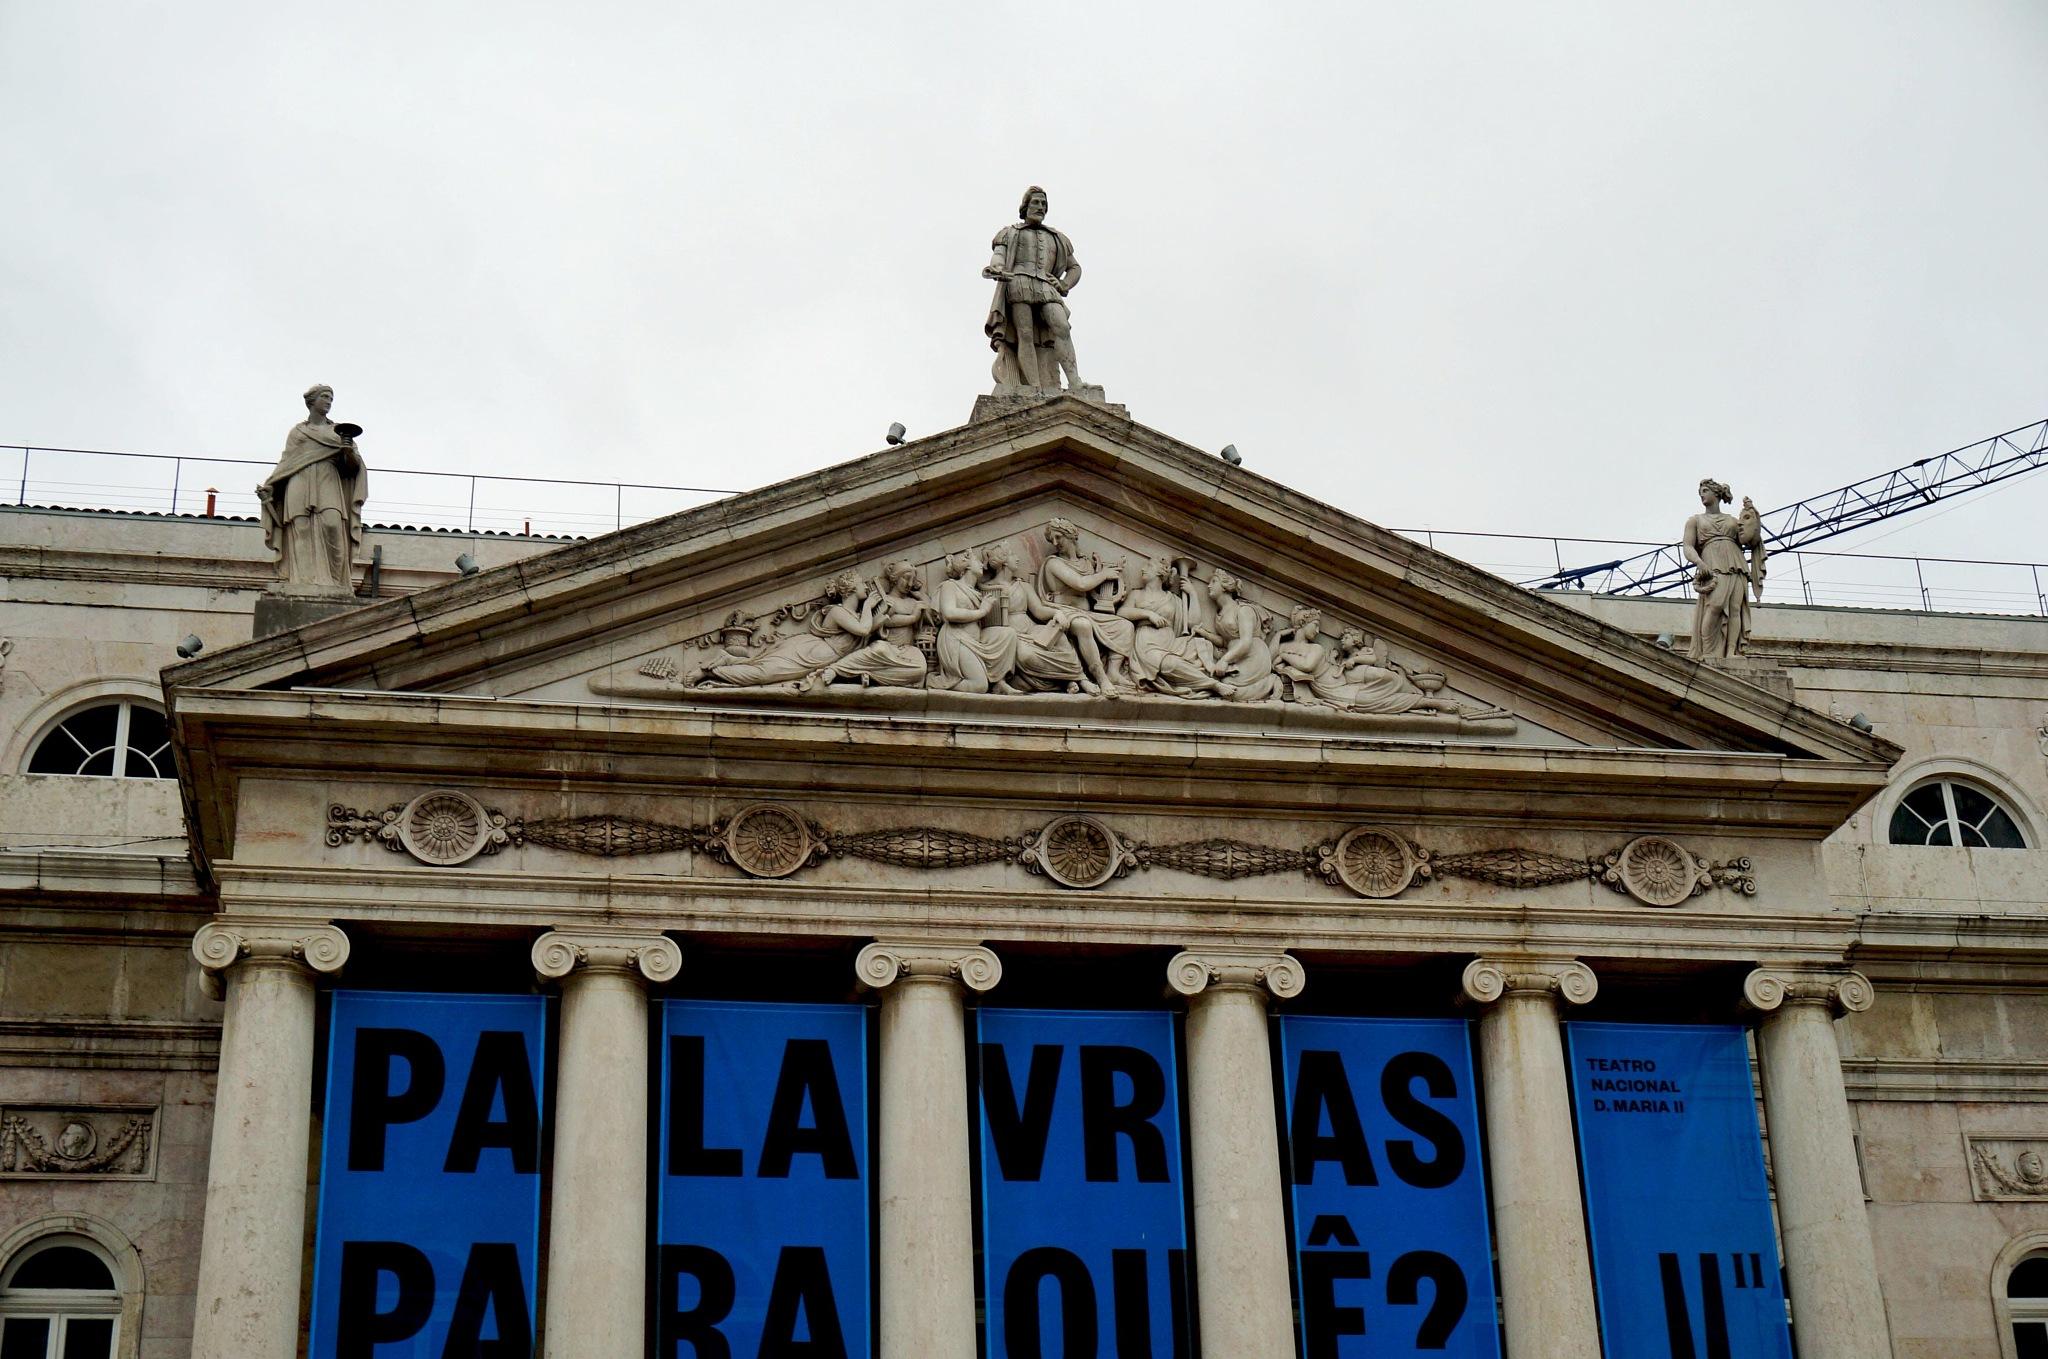 Teatro Nacional D. Maria II by elainedearaujo